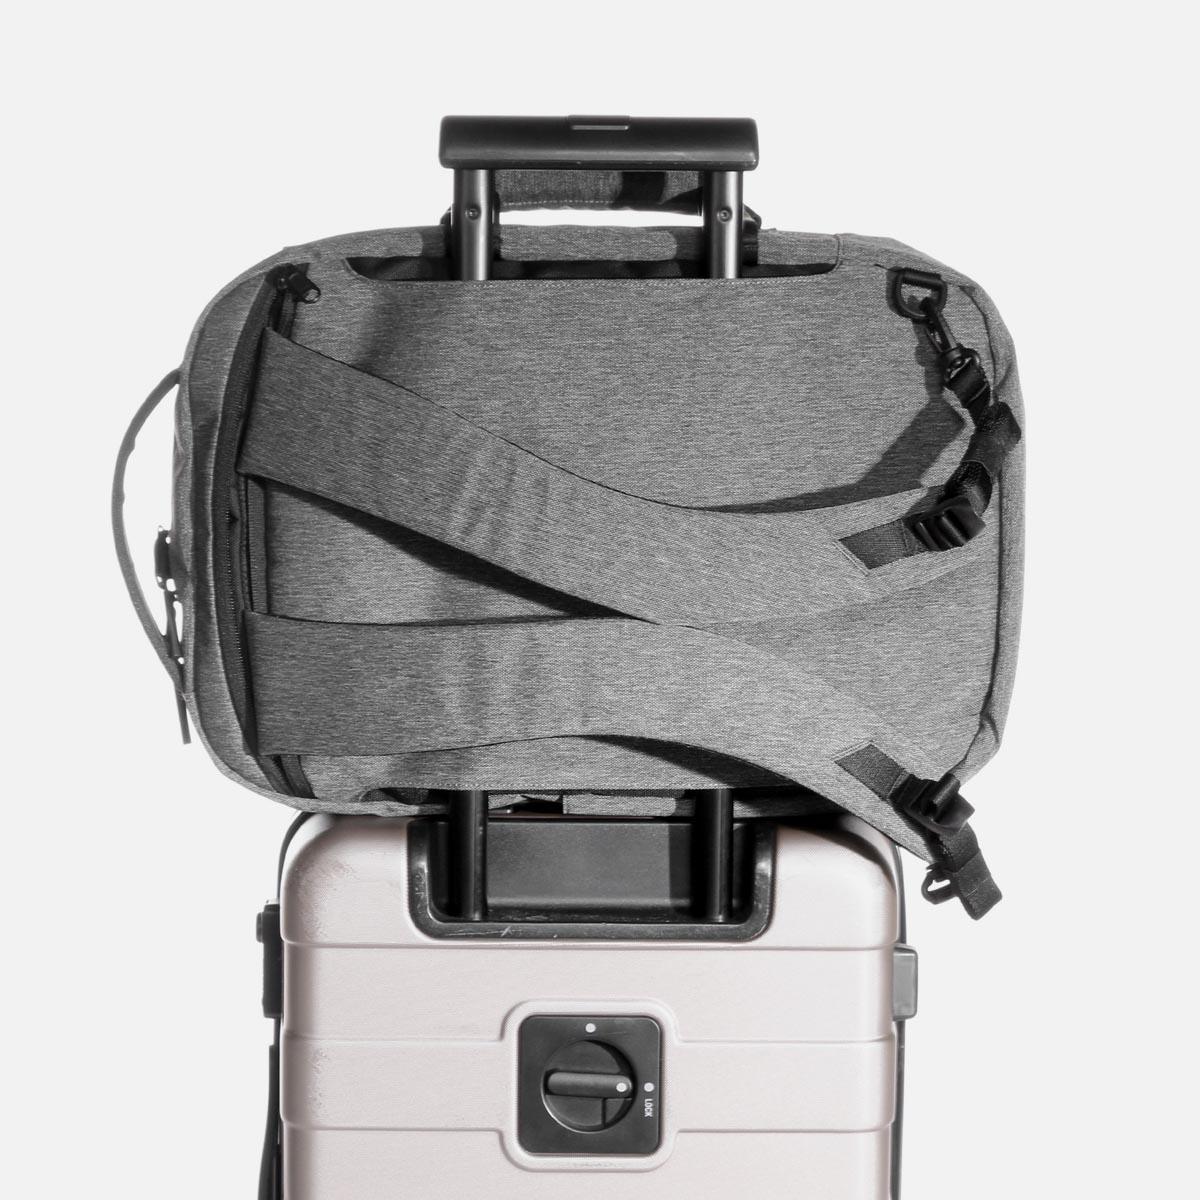 22010_fp2_gray_luggage.JPG